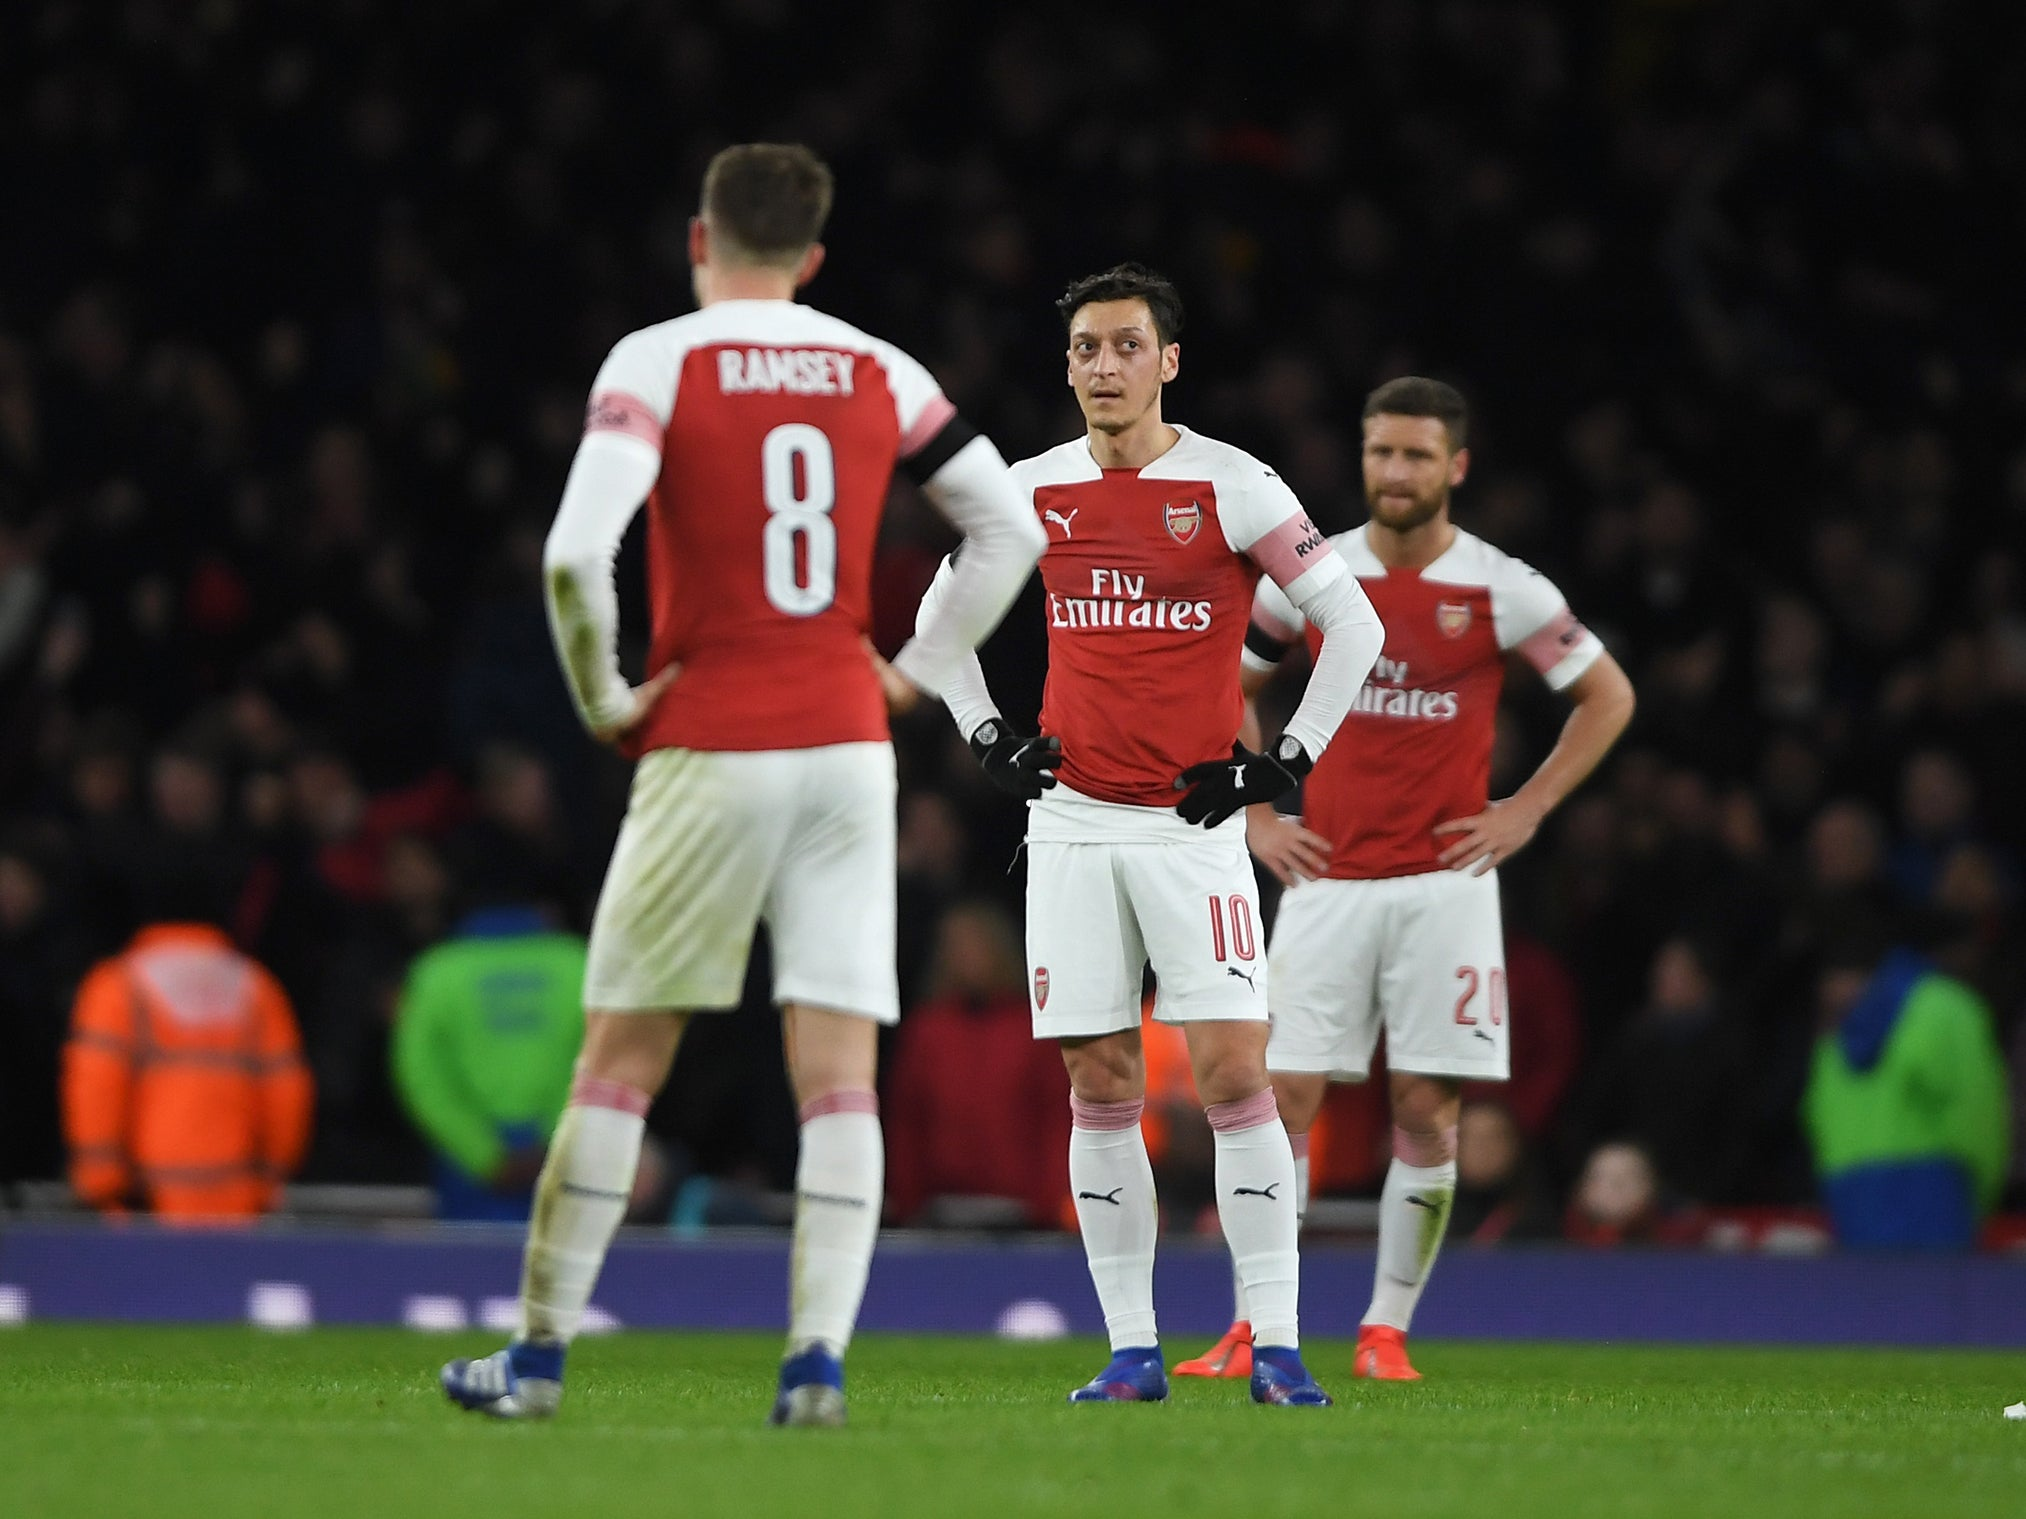 Joyless and bloodless, Stan Kroenke's Arsenal has lost all sense of purpose